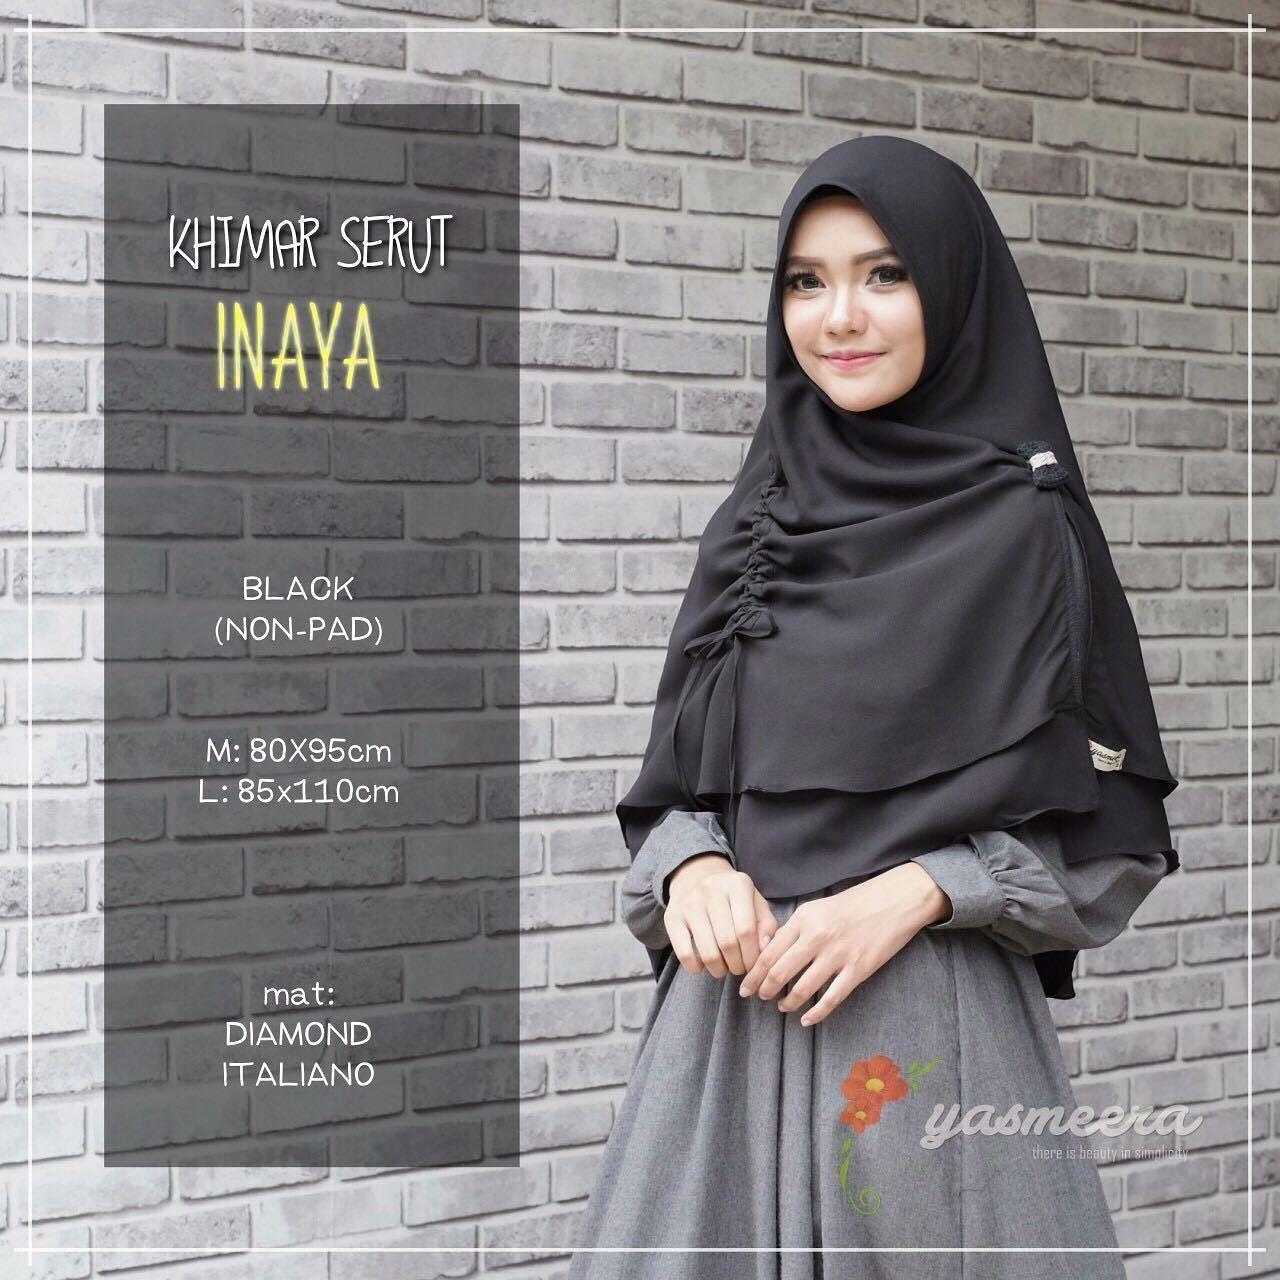 Yasmeera Khimar Serut Inaya Non Pad Black - hijab kerudung khimar